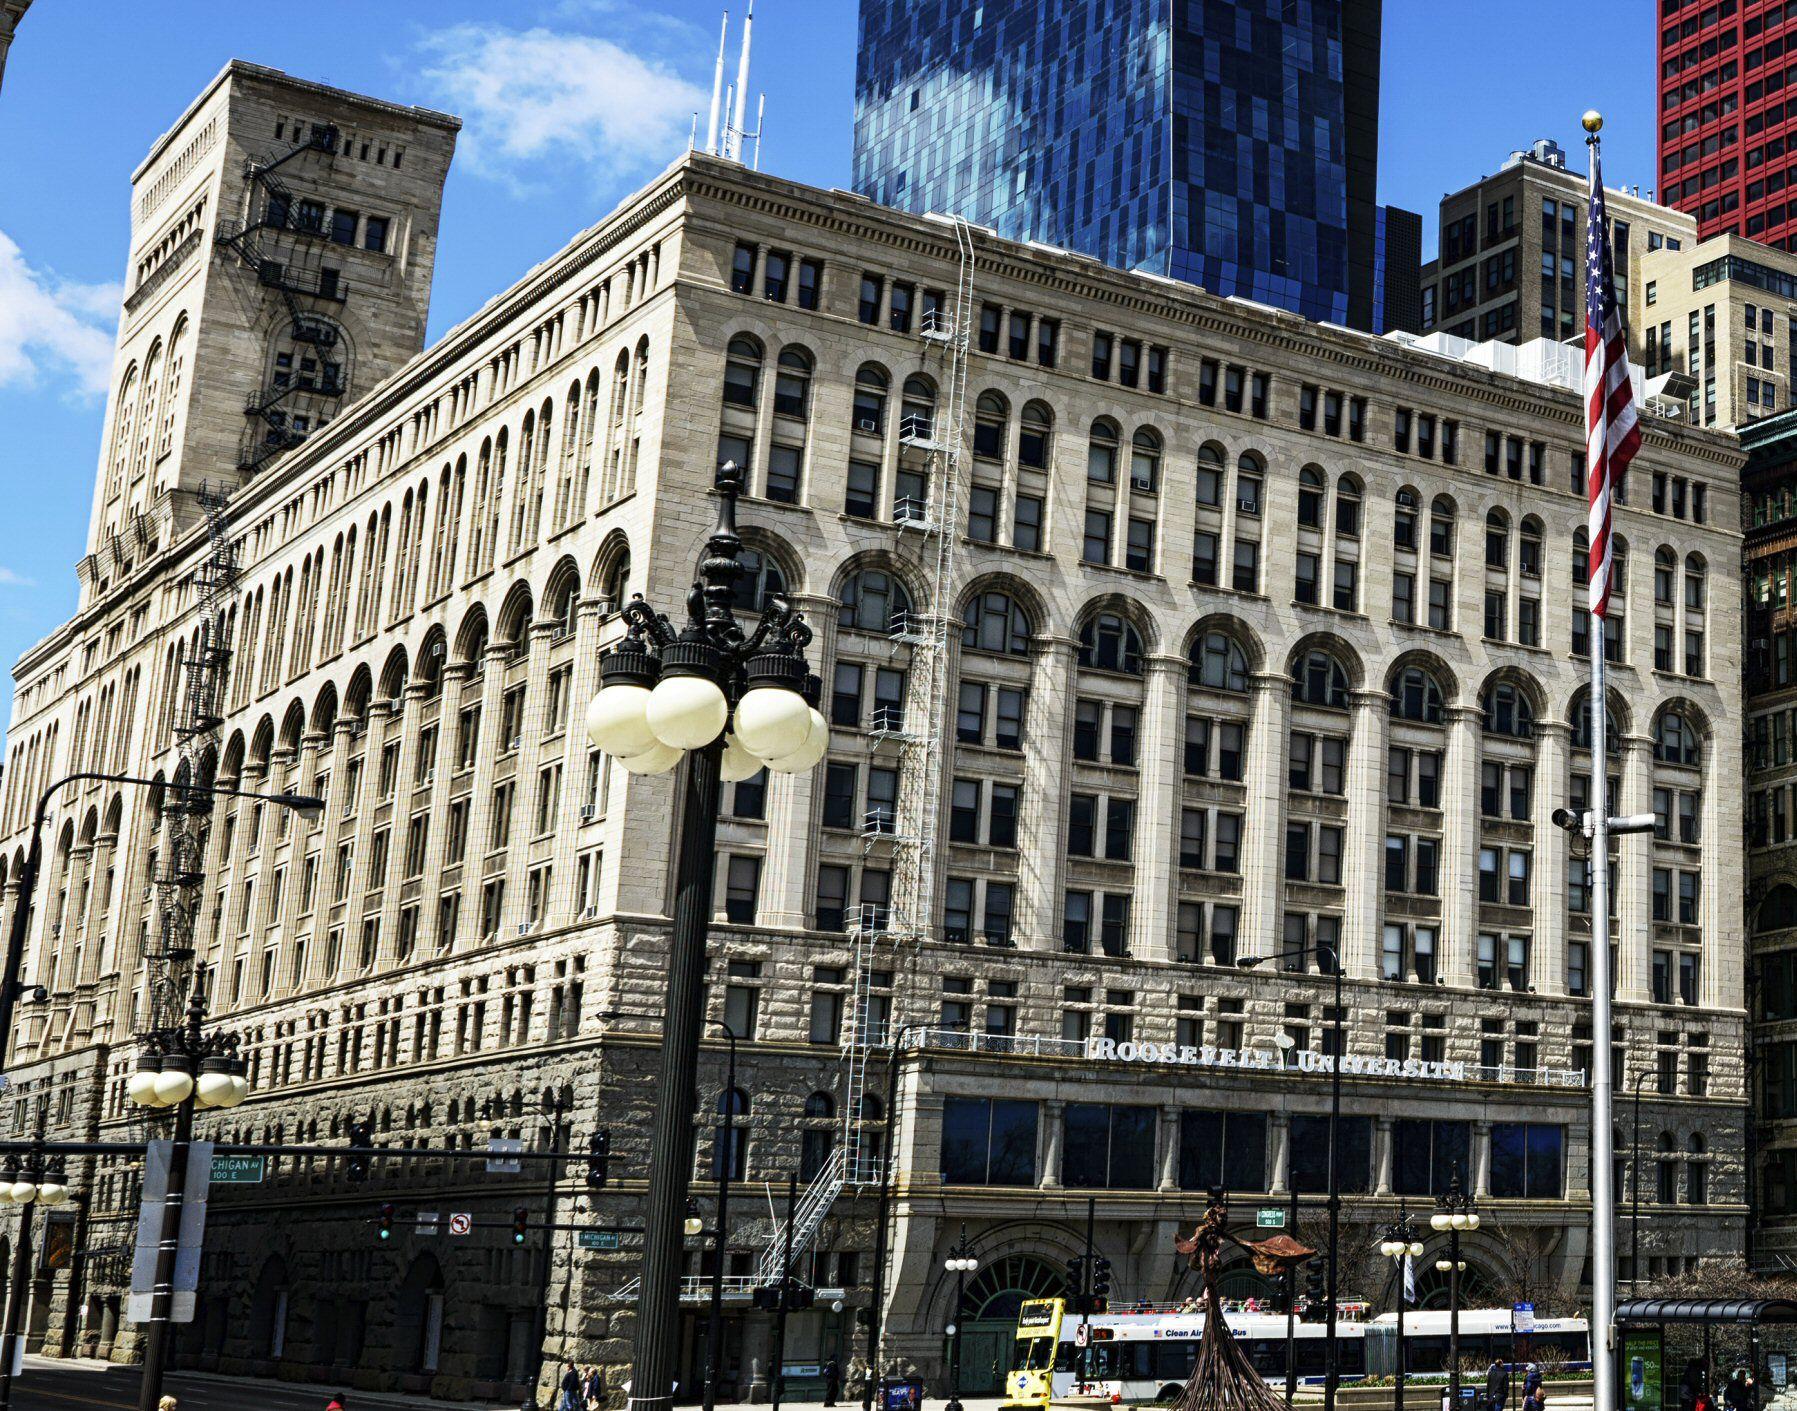 Auditorium Building on South Michigan Avenue in Chicago